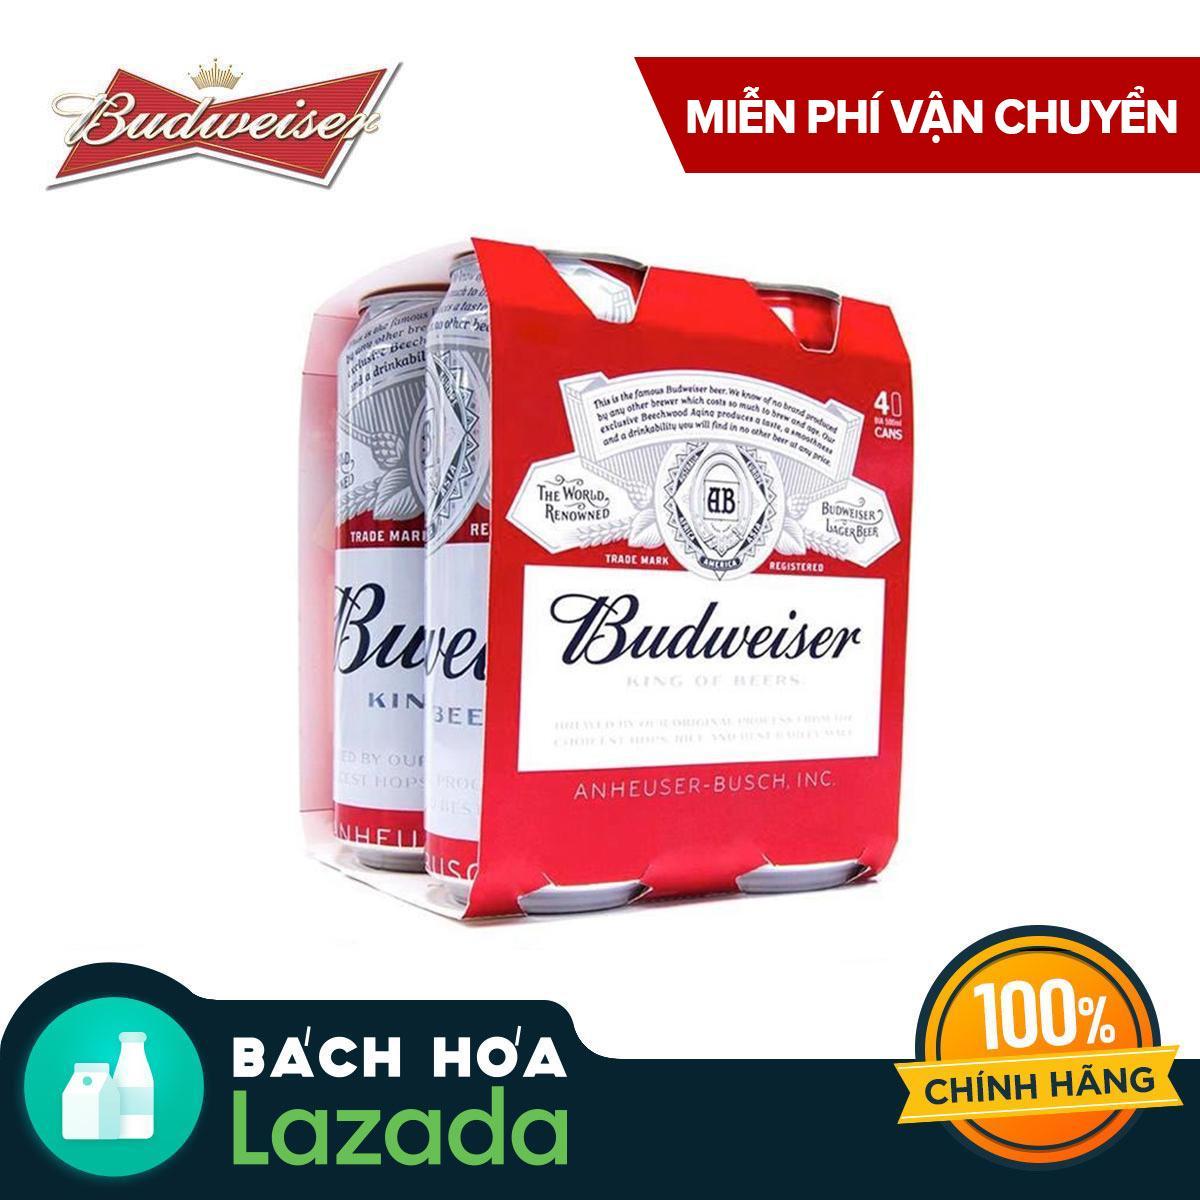 Lốc 4 lon Bia Budweiser 500ml Nhật Bản